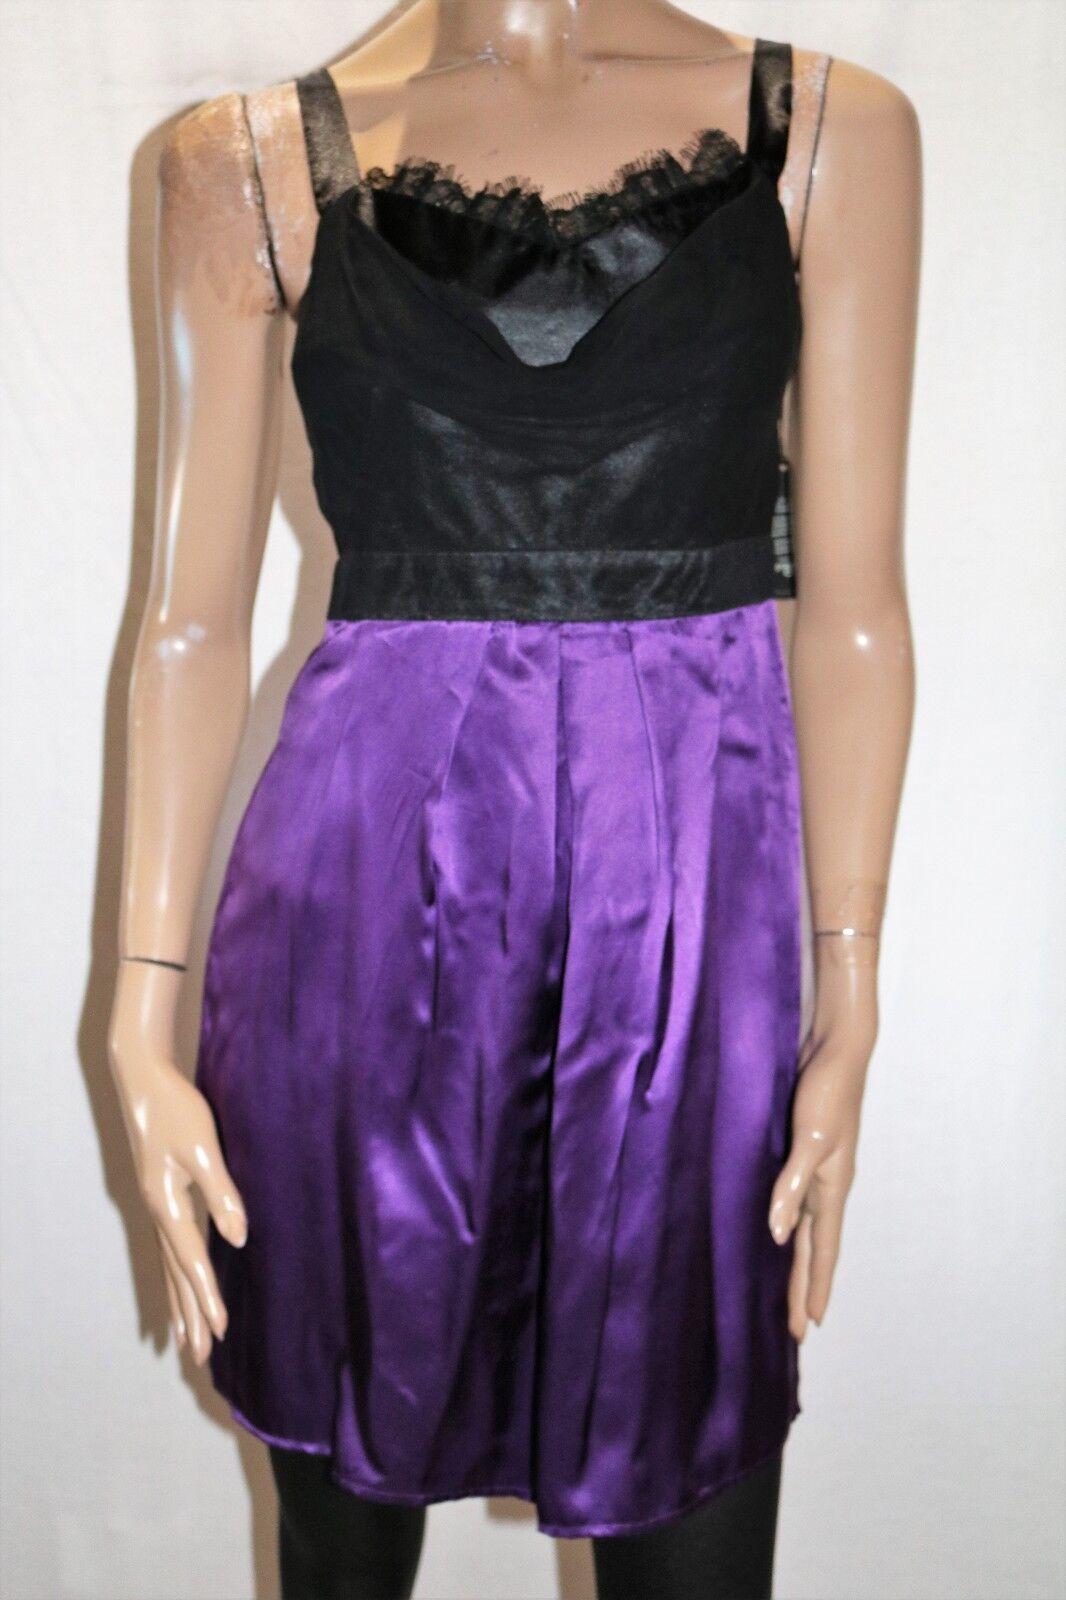 Grace & hart Brand schwarz lila Silk Party Cocktail Dress Größe 10 BNWT  TT81